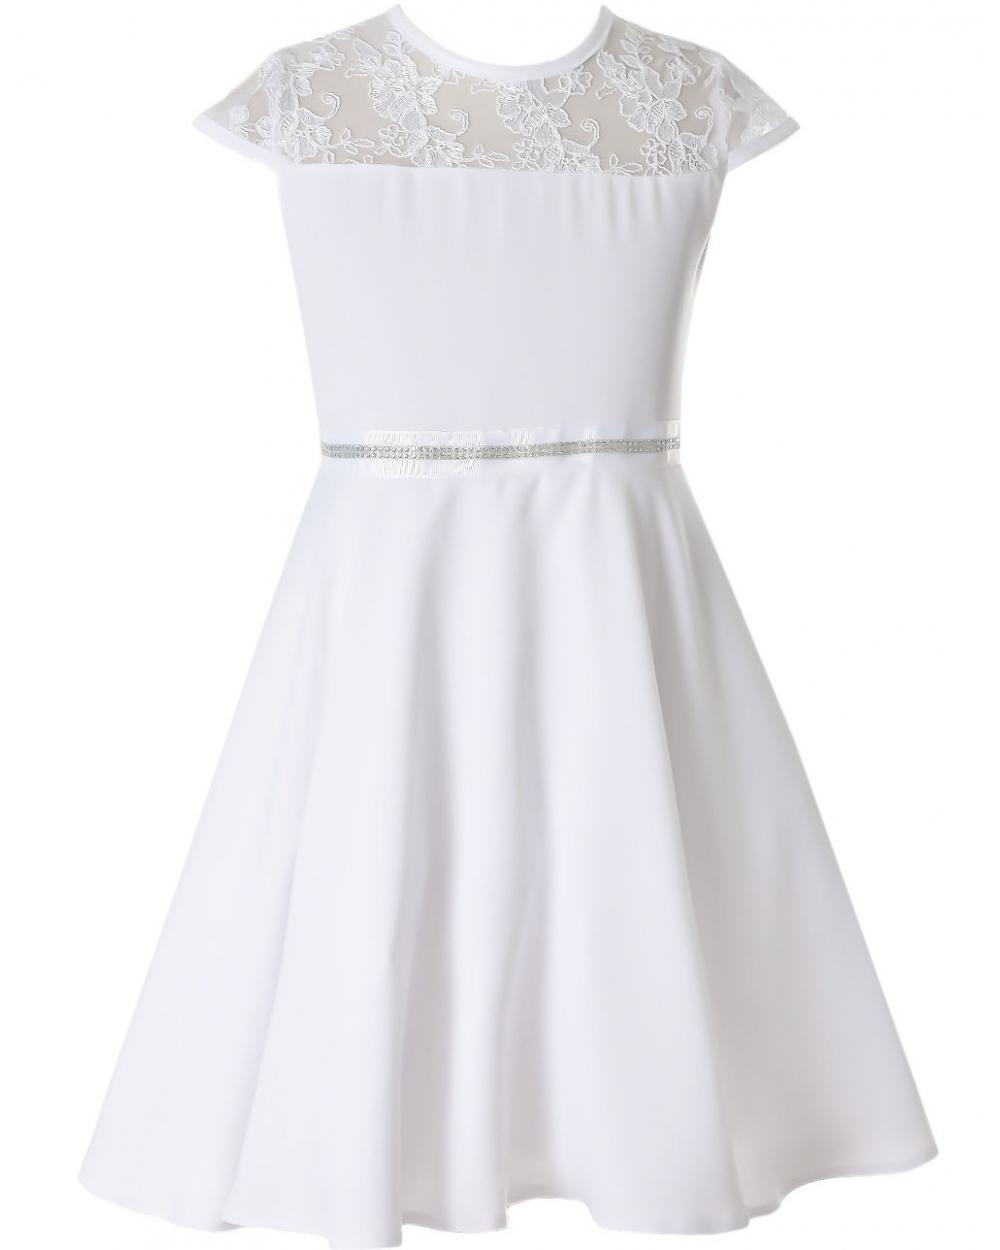 8f63ab8b0f Subtelna sukienka pokomunijna z koronką 134 - 158 Sofija biel